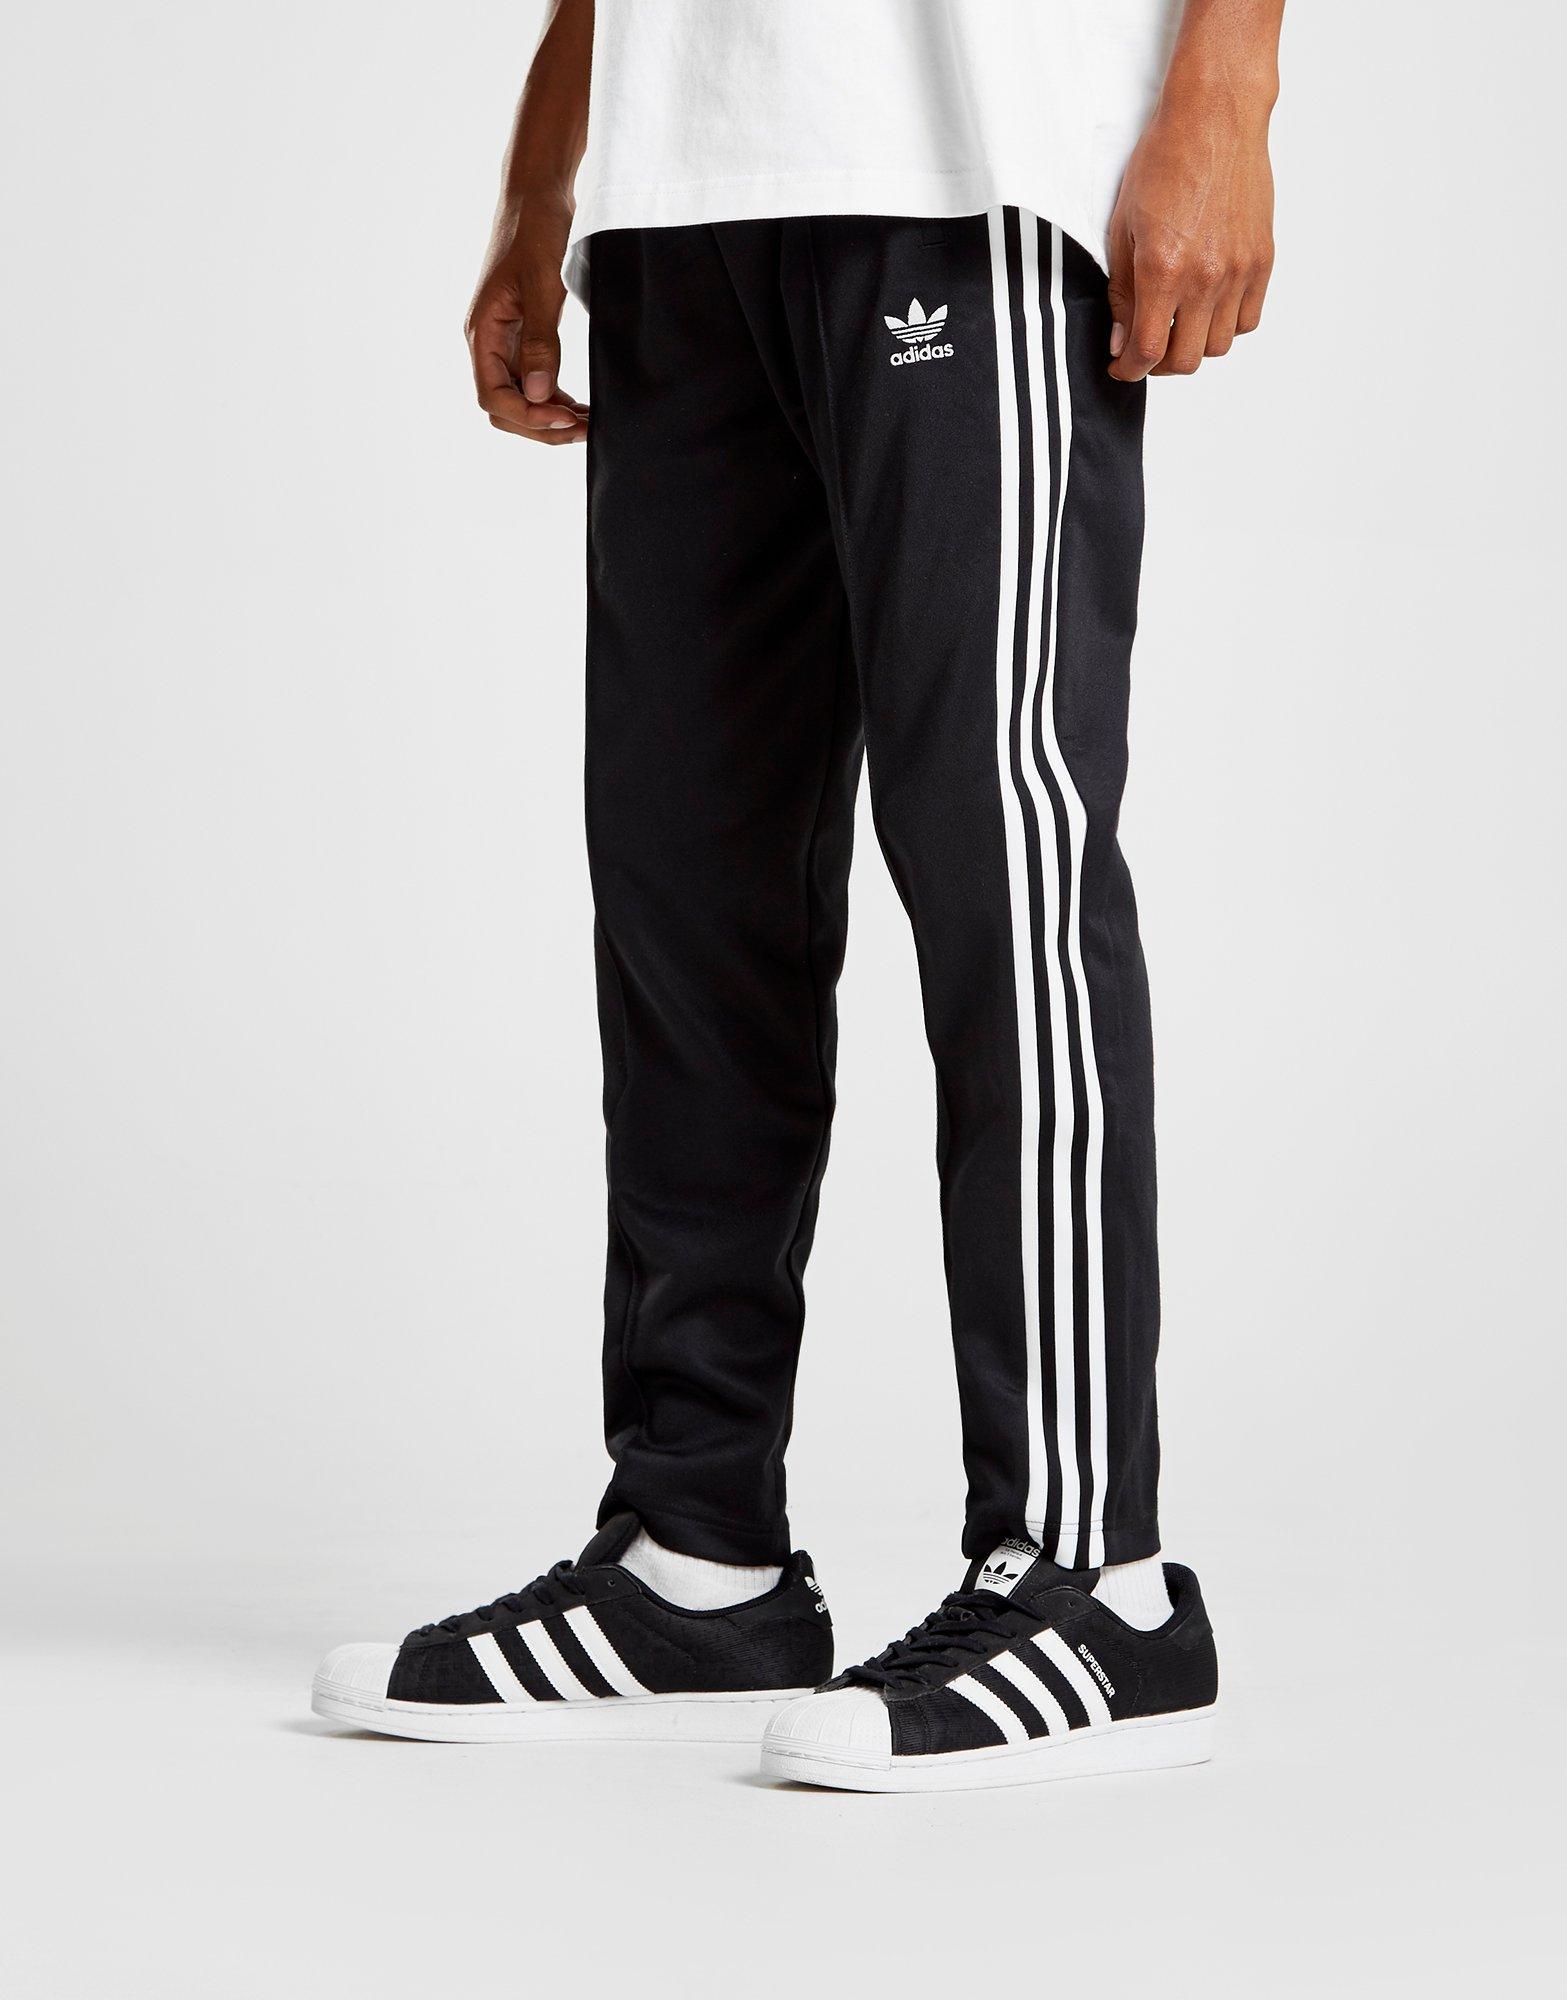 pantalon survet adidas